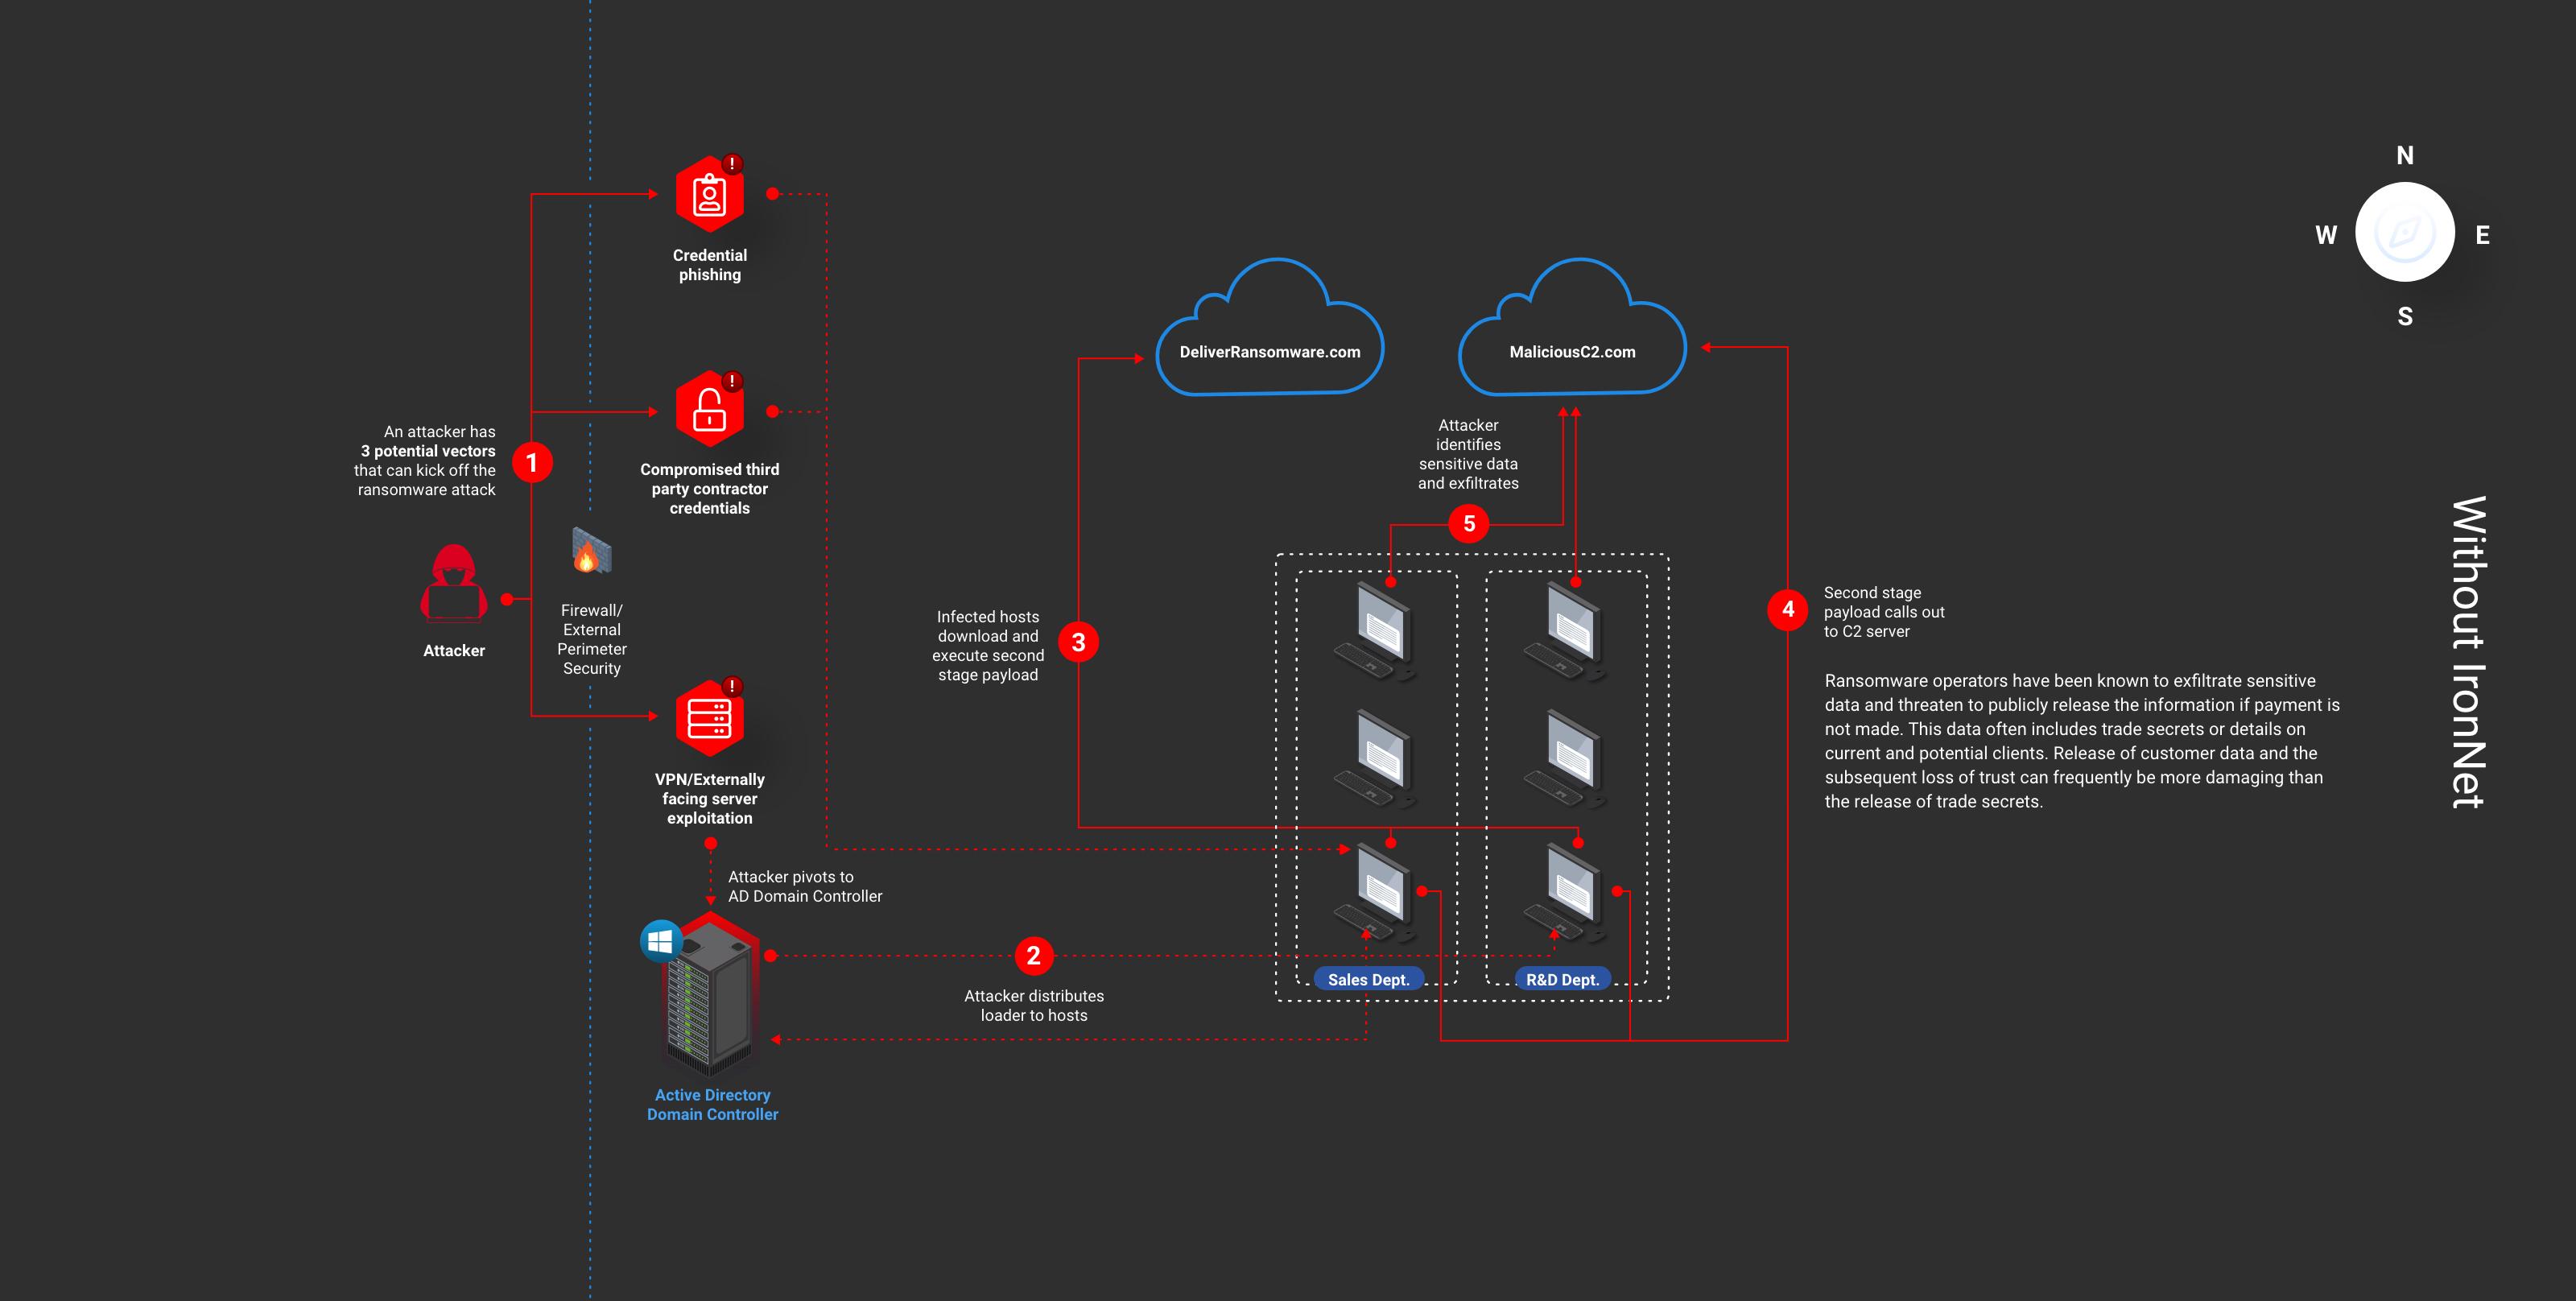 IronNet Ransomware Landing Page – Without IronNet@2x